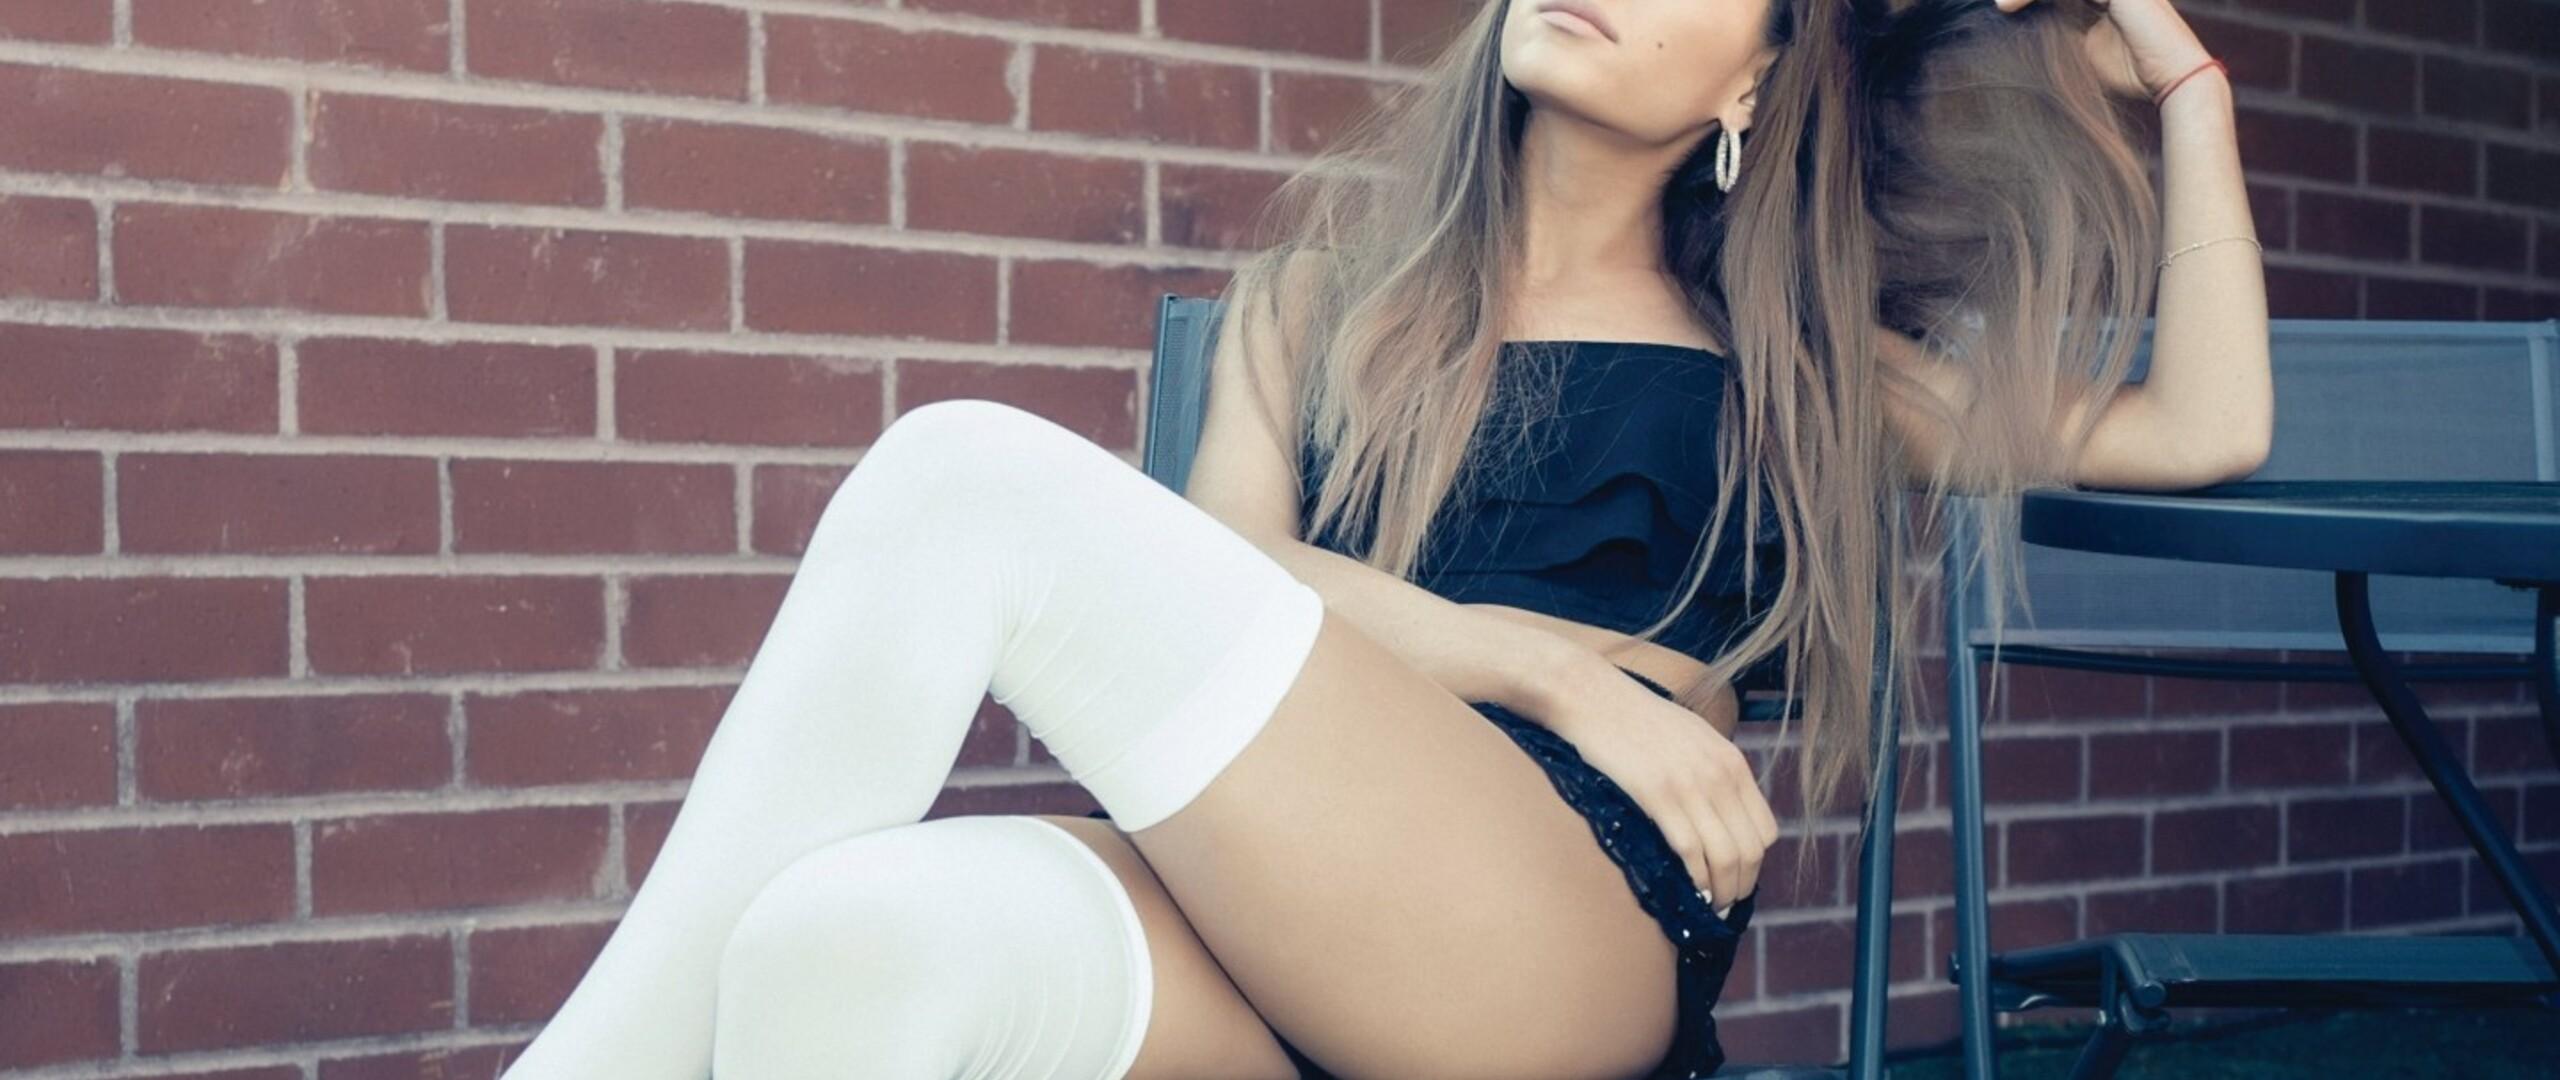 ariana-grande-legs.jpg